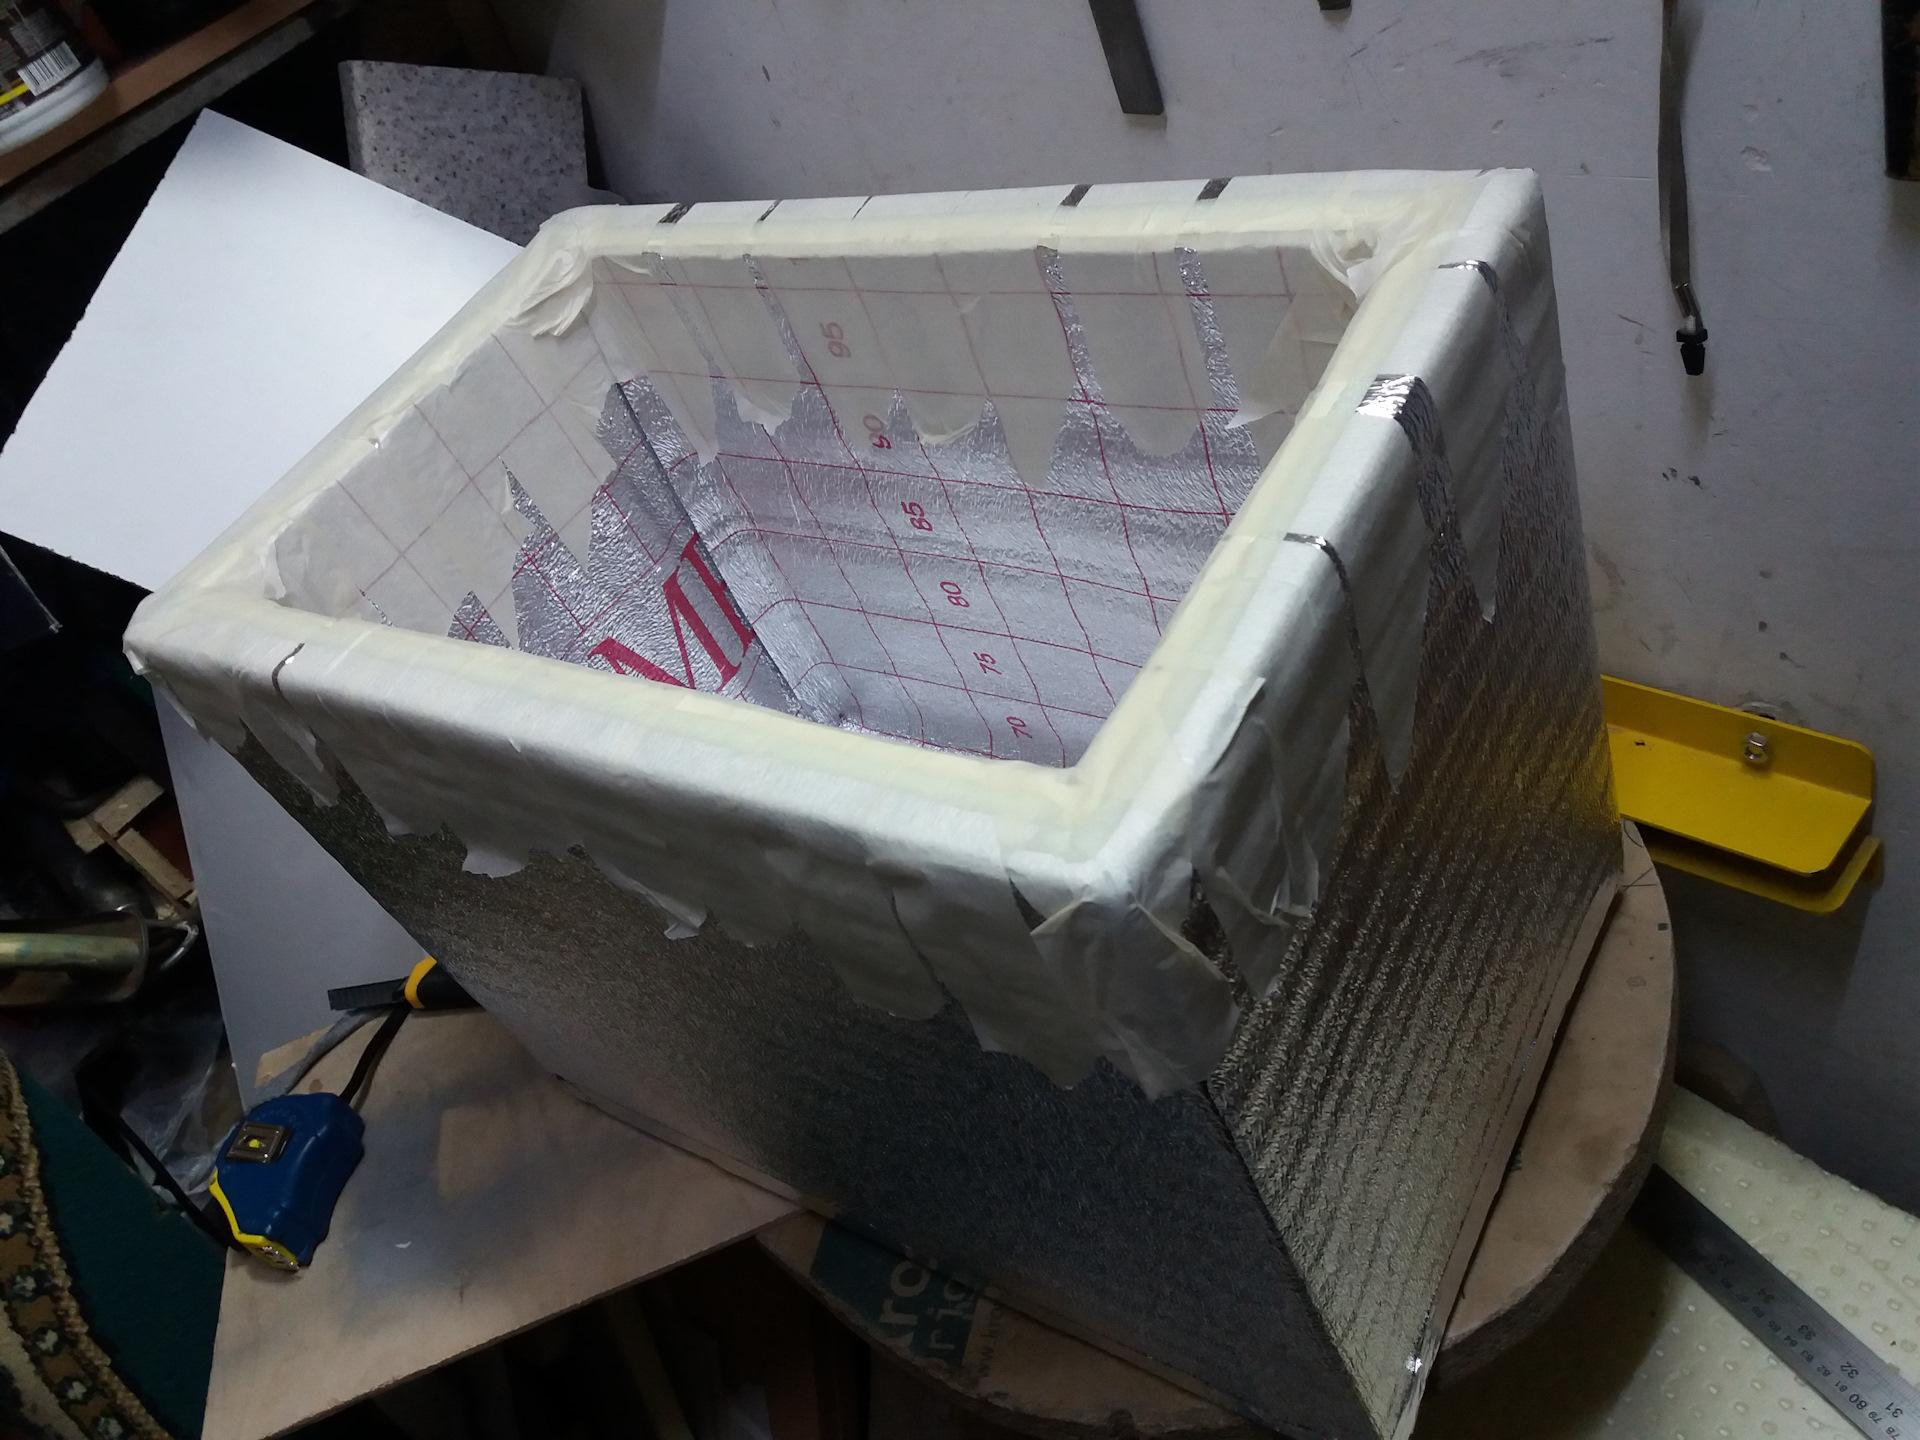 холодильник своими руками из пенопласта фото вот творог или